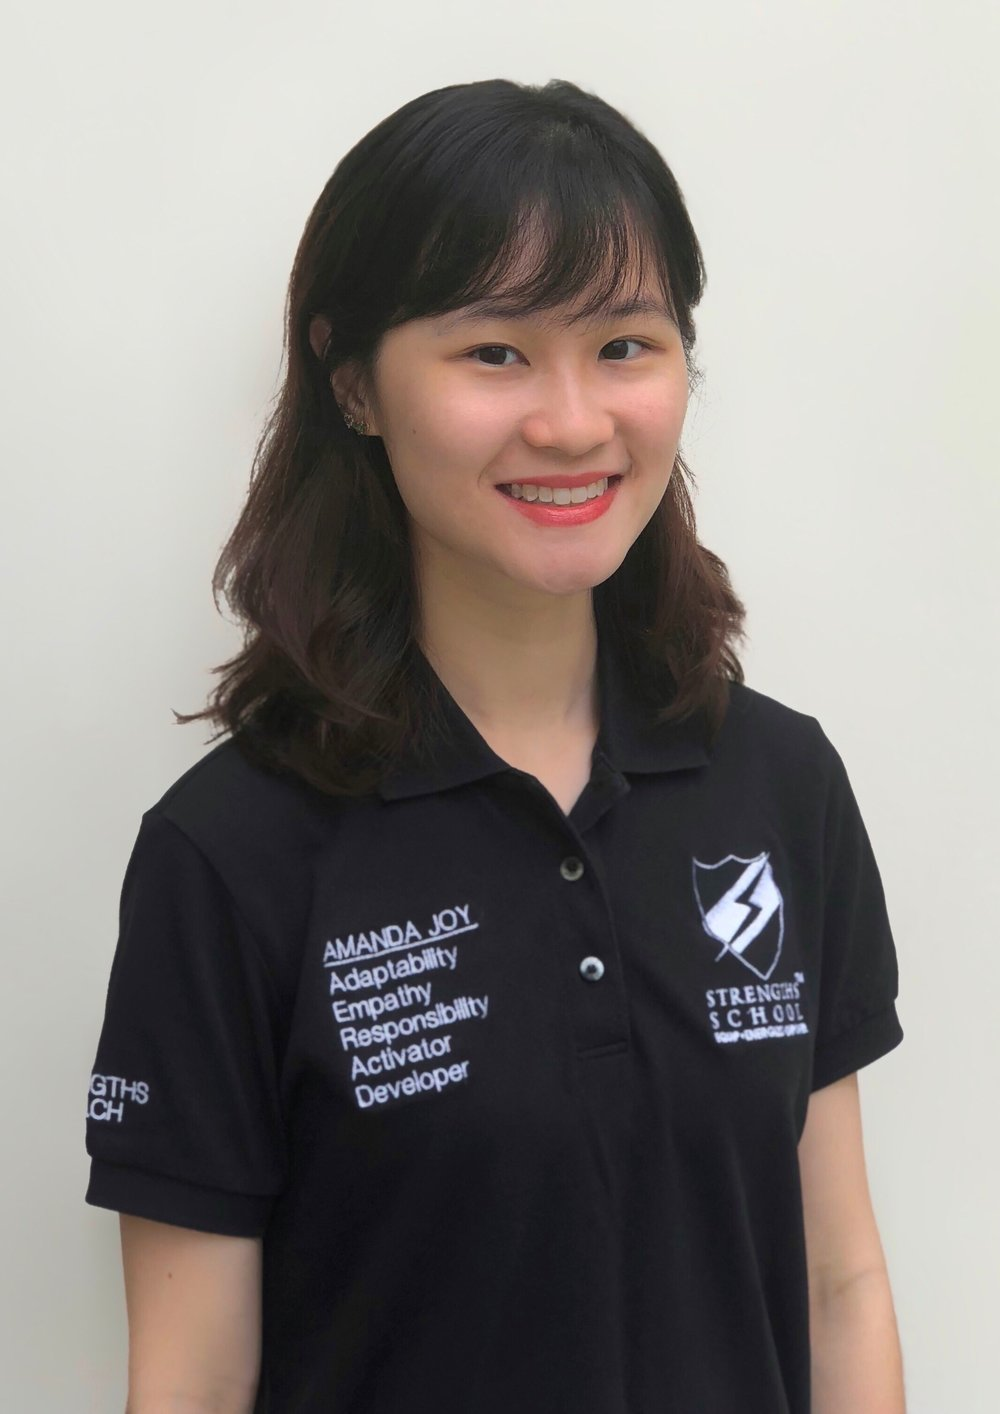 Amanda+Joy+Loh+Strengths+School+Singapore+StrengthsFinder.png